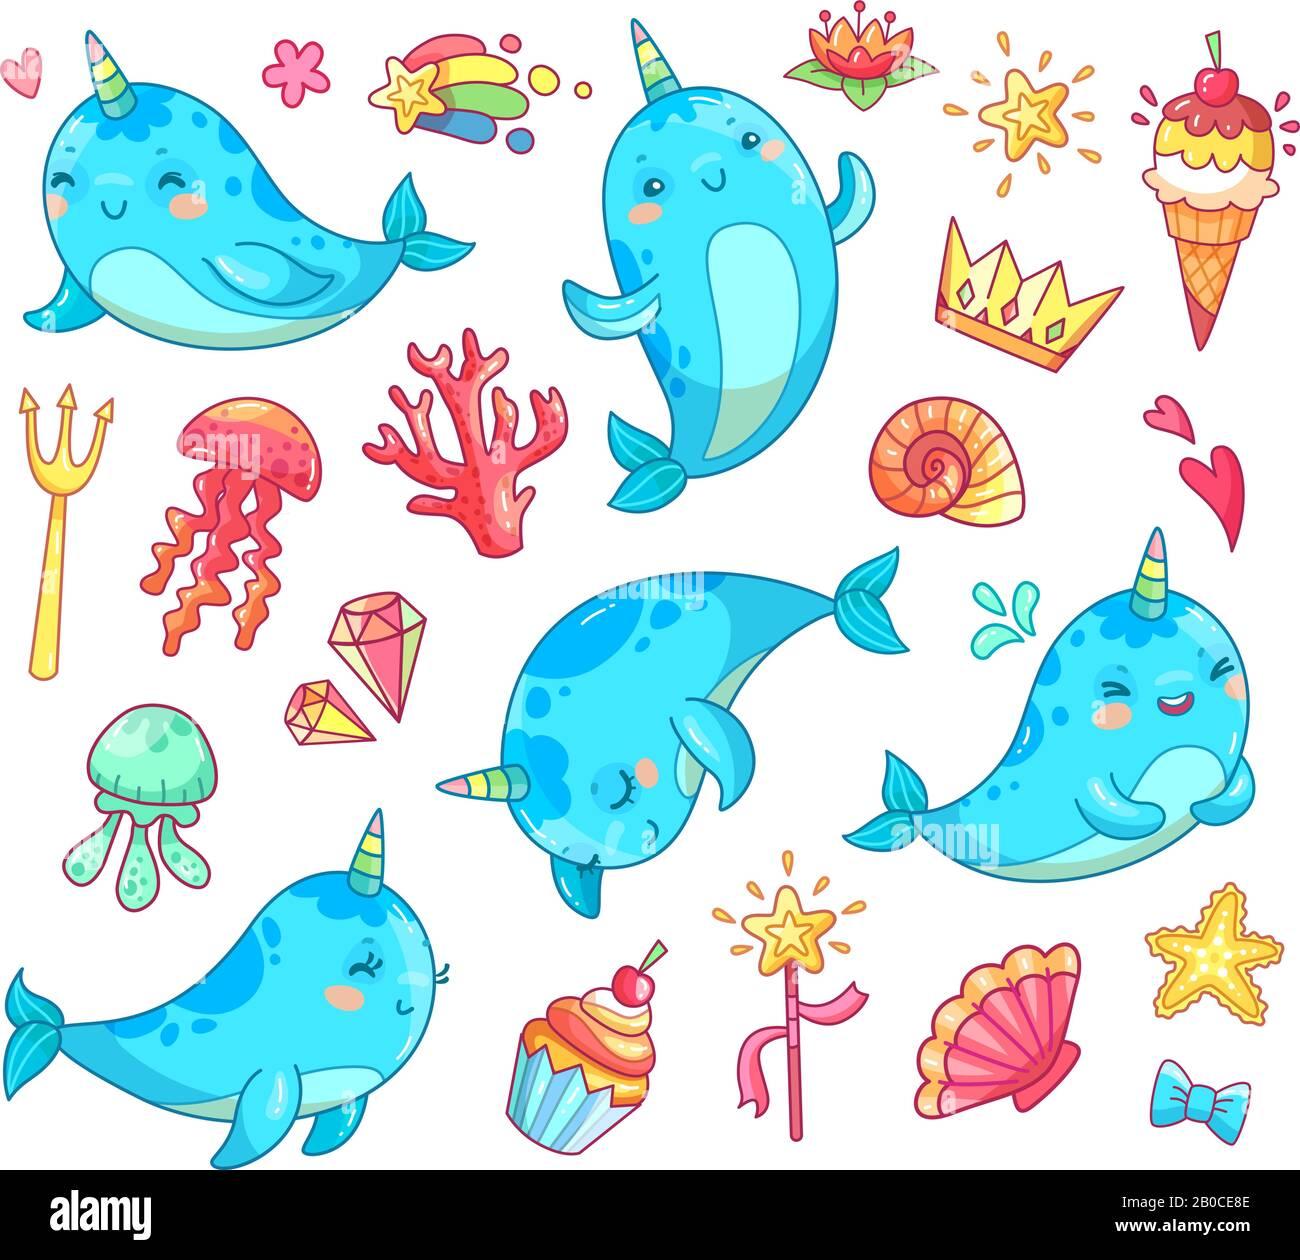 Marine Kawaii Baby Unicorn Narwhal Swimming Blue Funny Anime Whale Vector Cartoon Clipart Stock Vector Image Art Alamy